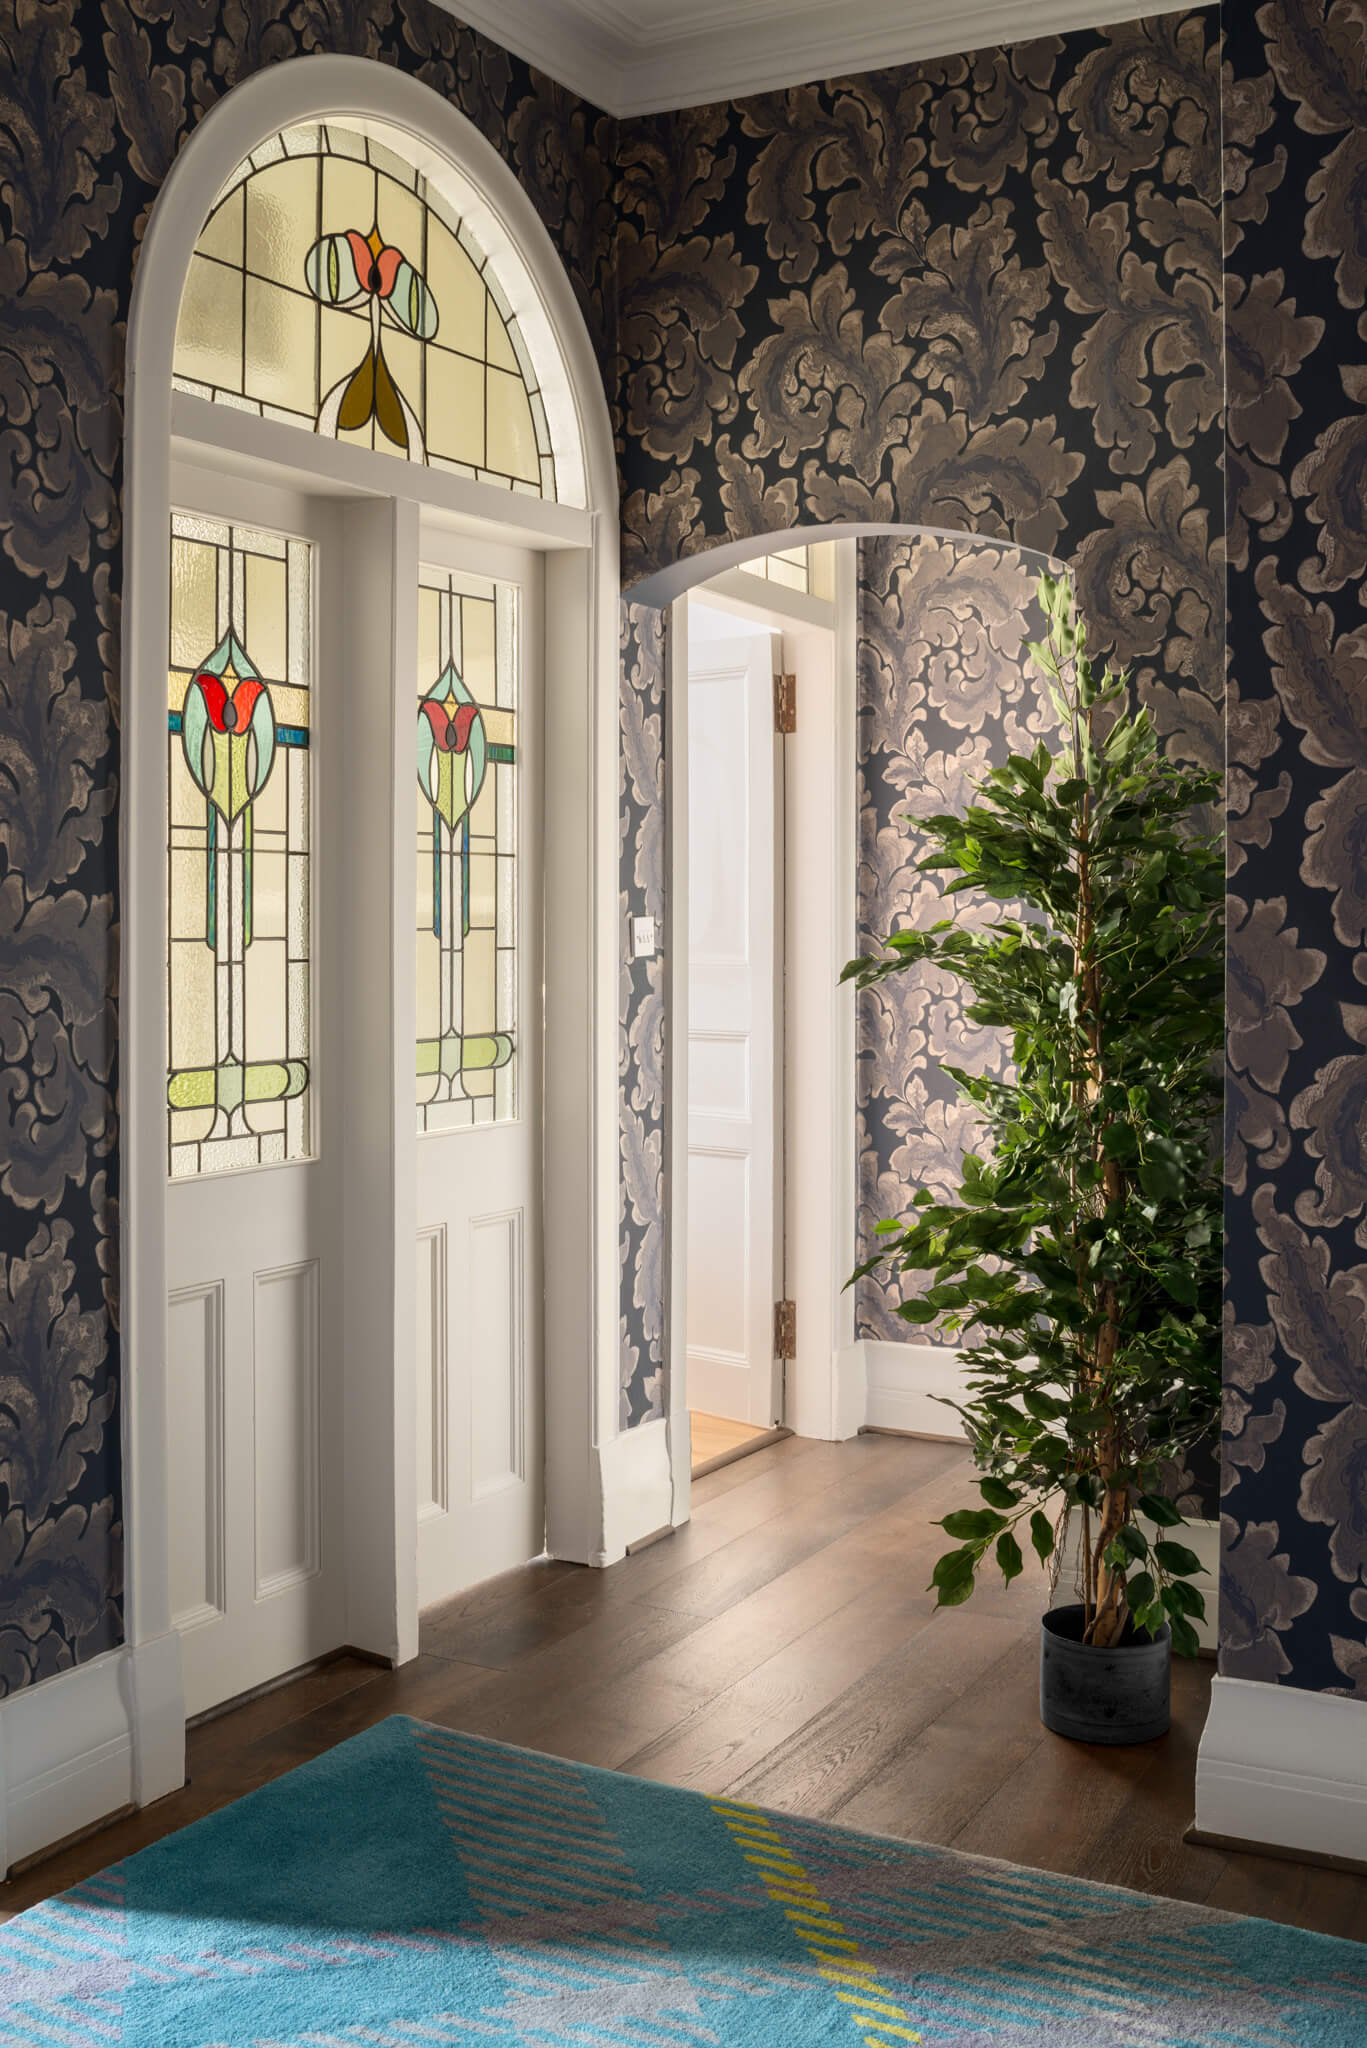 Print-Hall-to-Glass-Doors-Chelsea-Mclaine-Interiors-Introductory-Shoot-©ZACandZAC